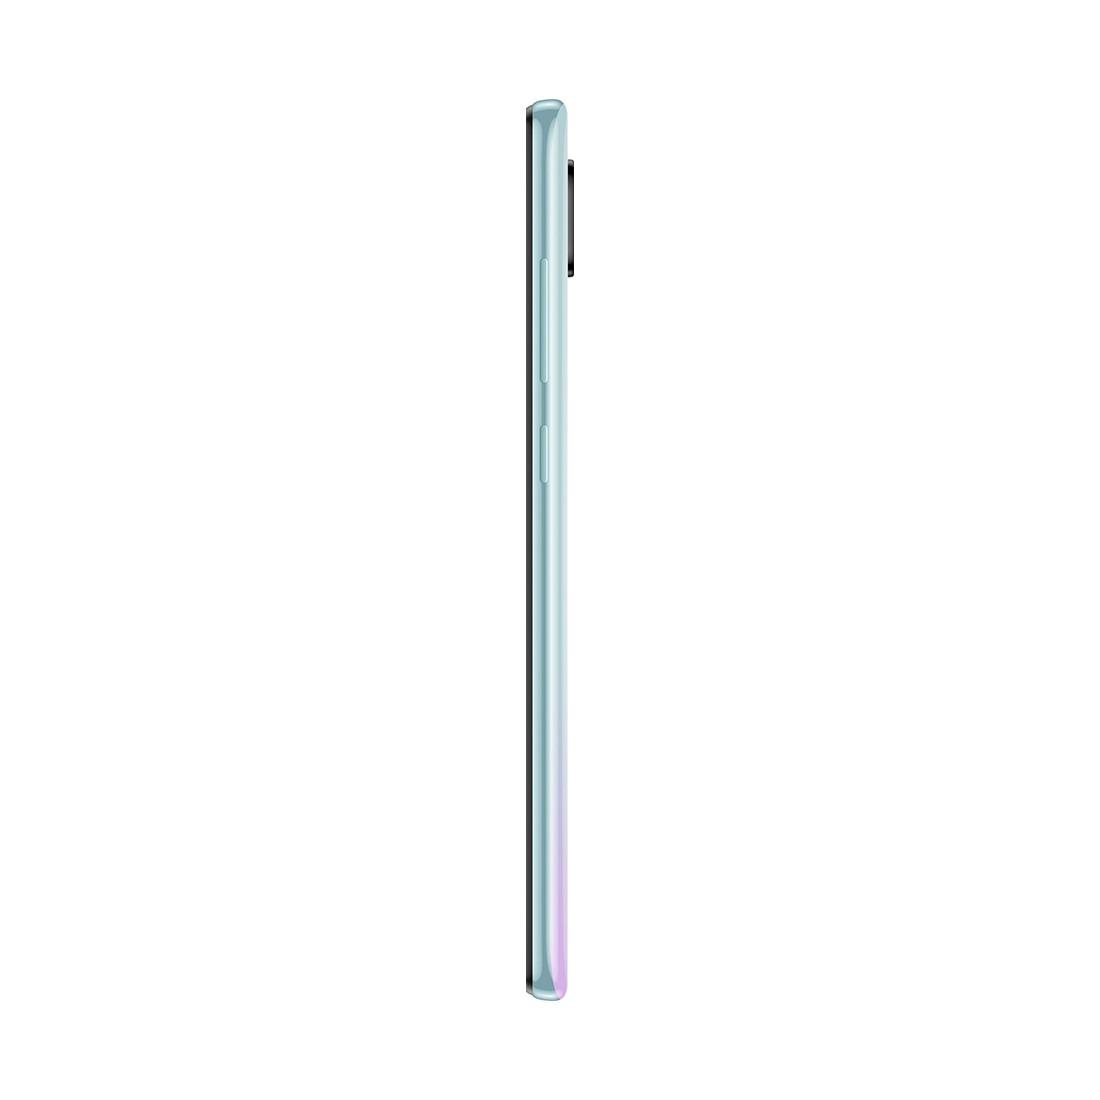 Мобильный телефон Xiaomi Redmi Note 9 64GB Polar White